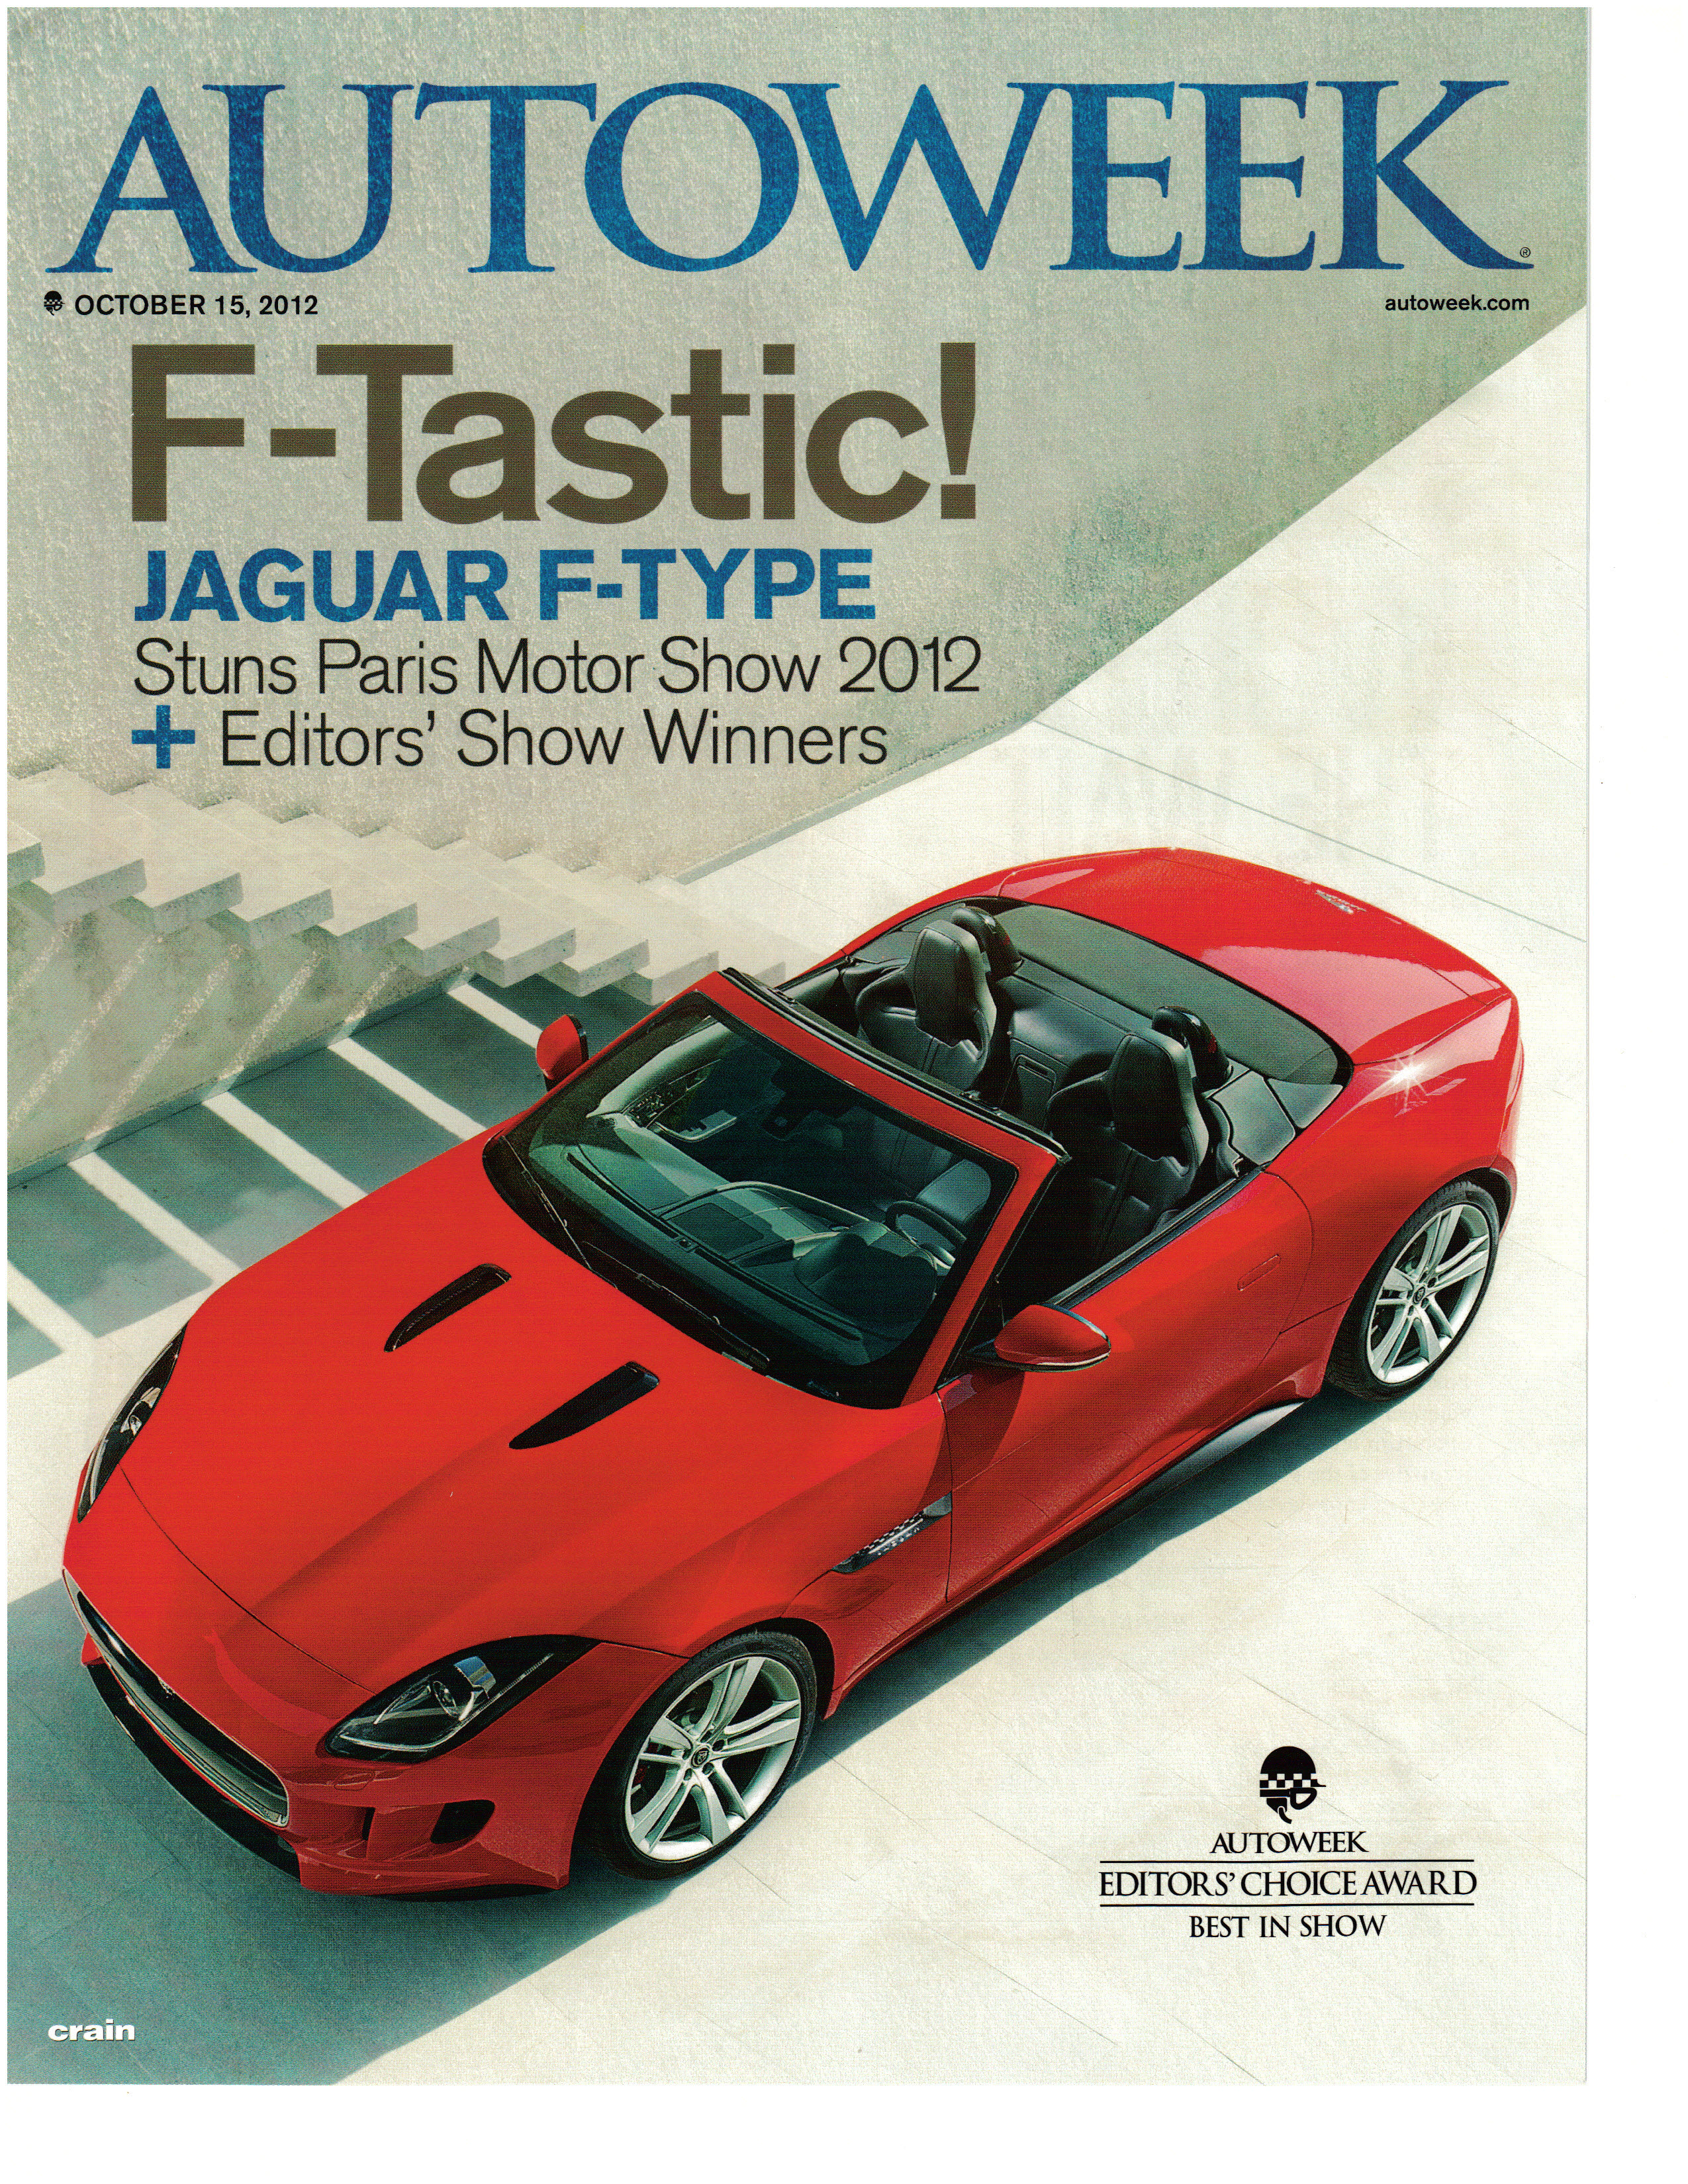 2014 Jaguar F Type roadster tramps convertible petition – MYCARLADY